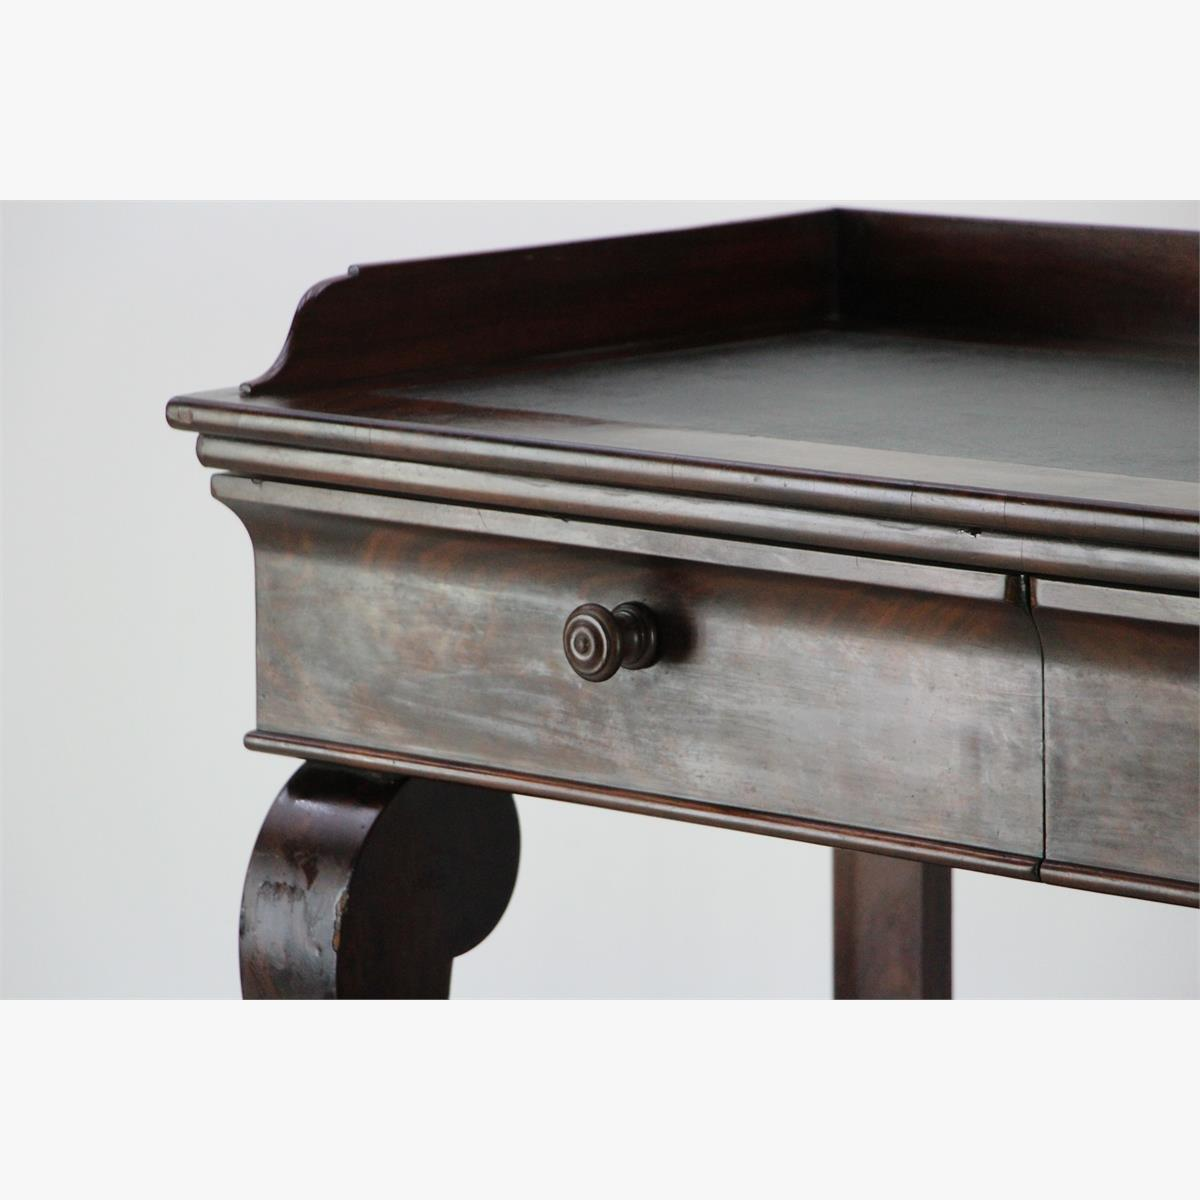 Afbeeldingen van mahonie - trumeau side tabla empire stijl